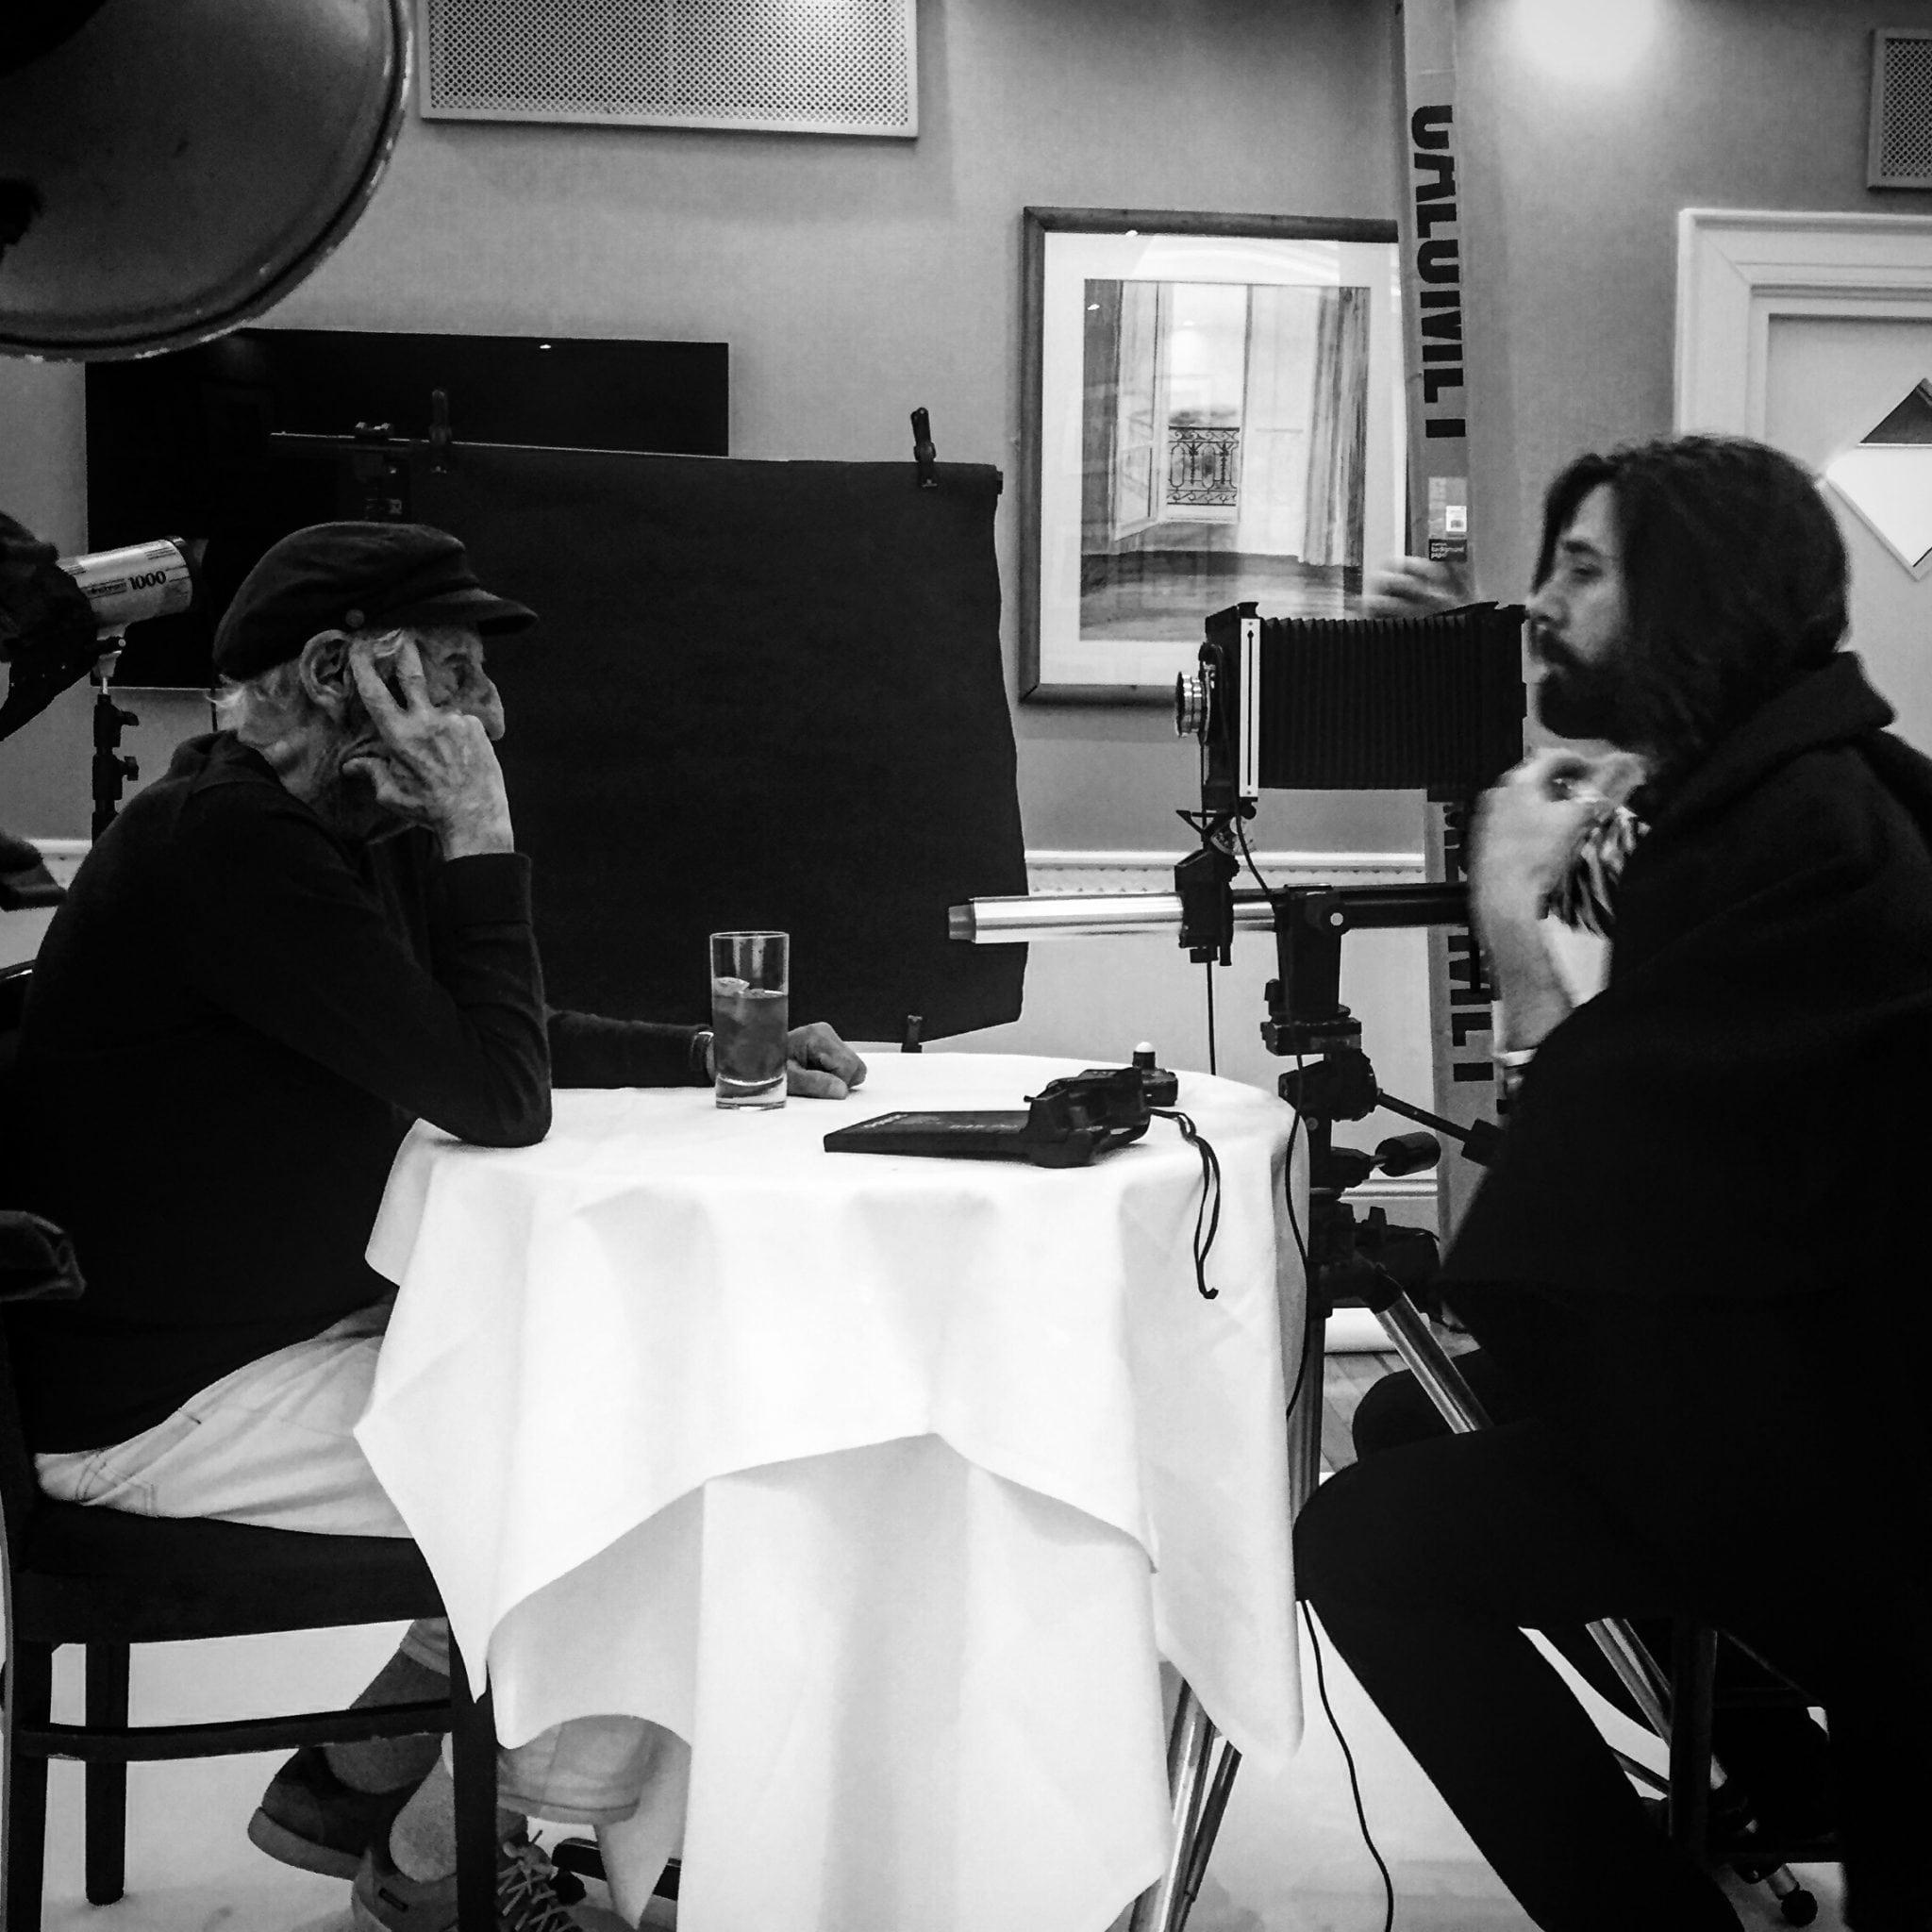 Glenn Dearing Talks Photography & His Connection to AUB